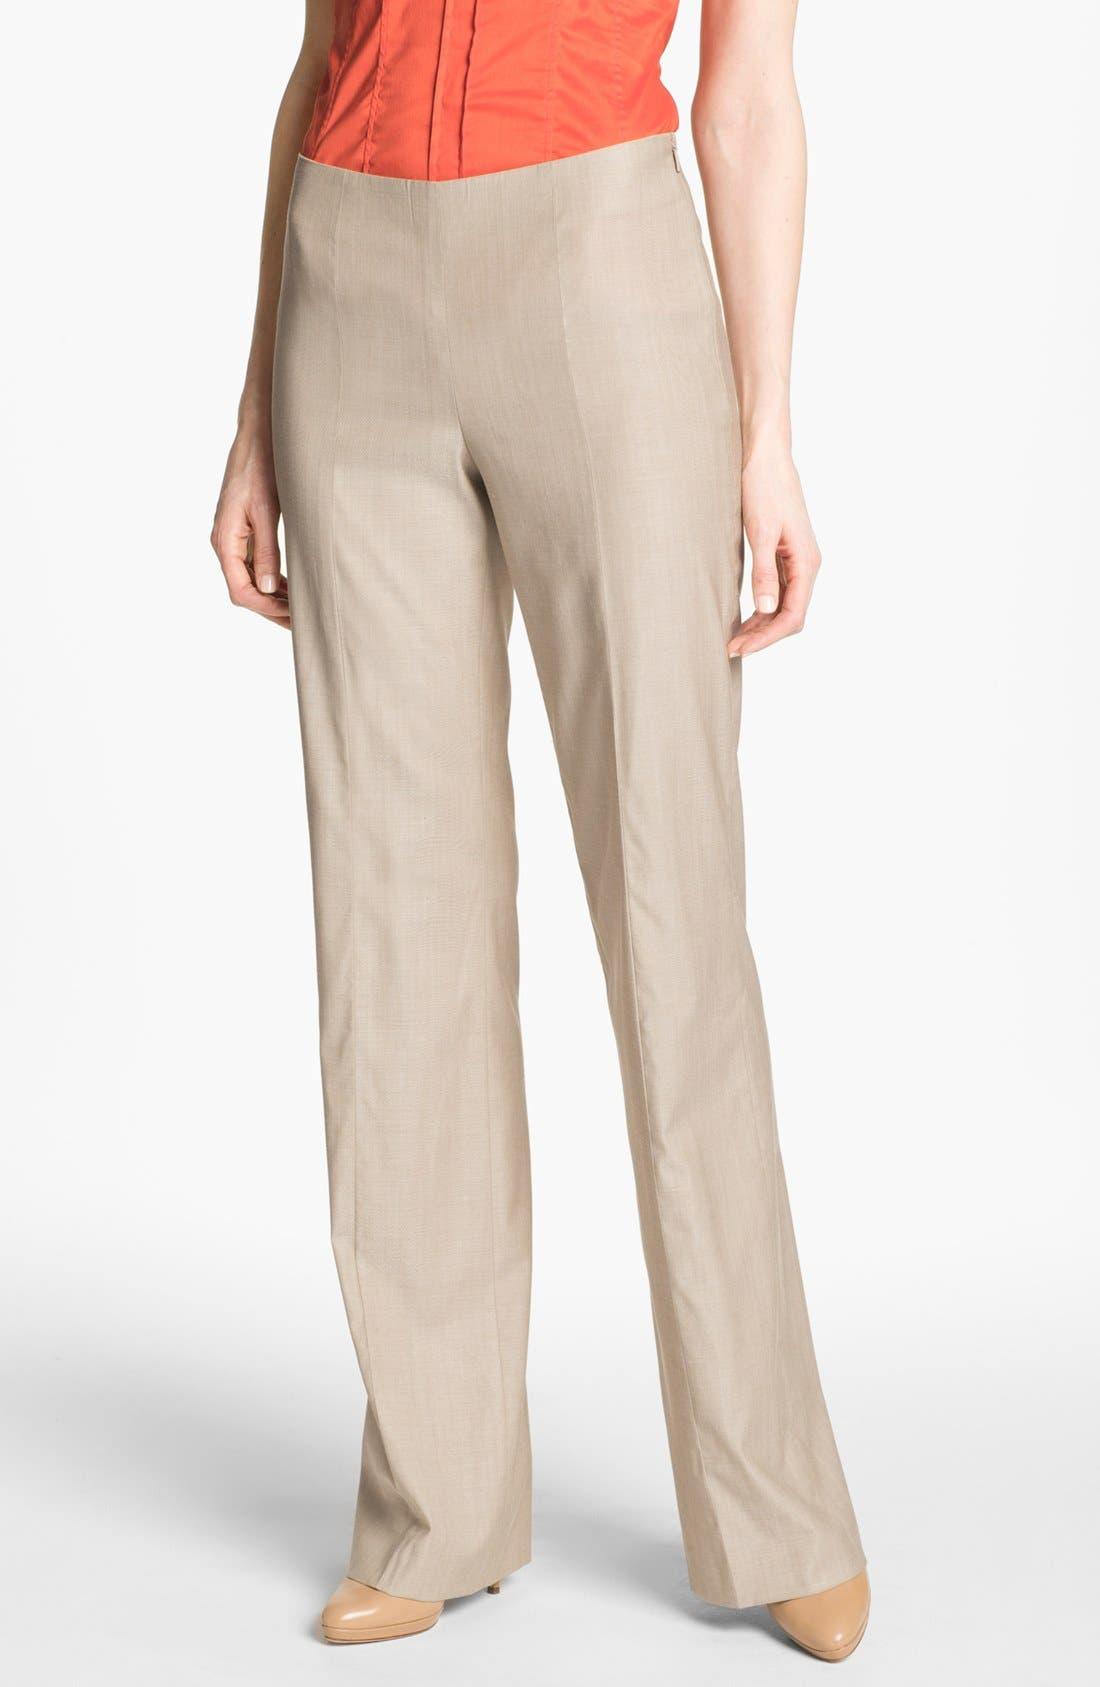 HUGO BOSS 'Tilana' Trousers,                             Main thumbnail 1, color,                             294